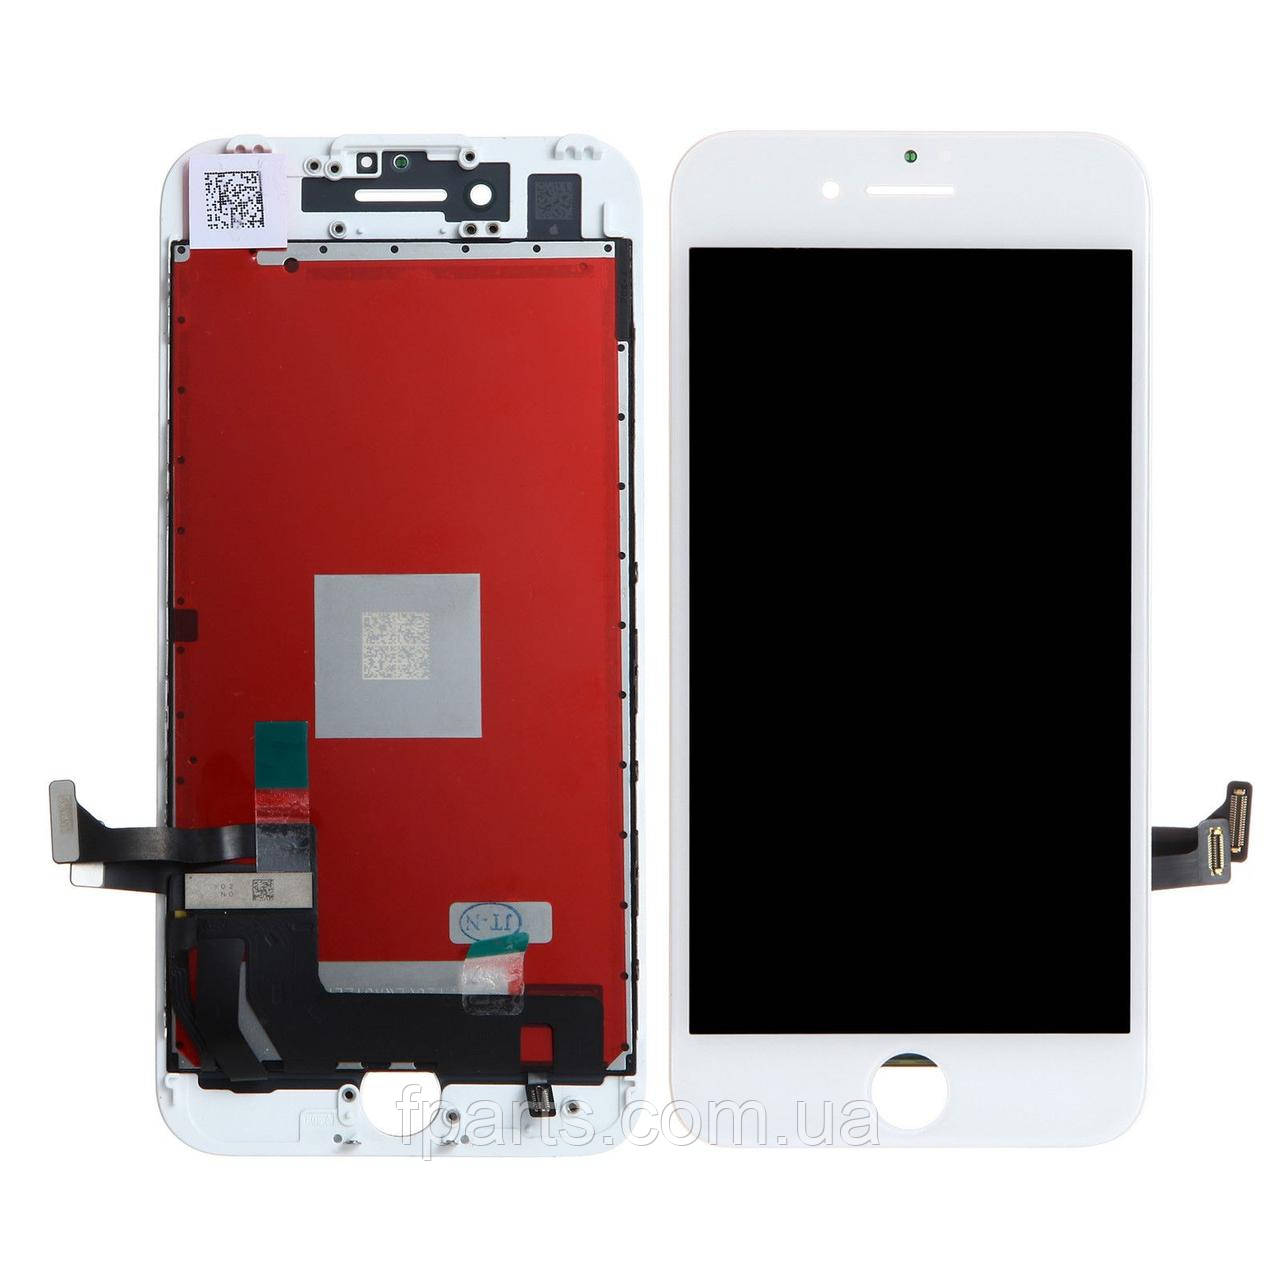 "Дисплей iPhone 7 (4.7"") з тачскріном, White (Original PRC)"